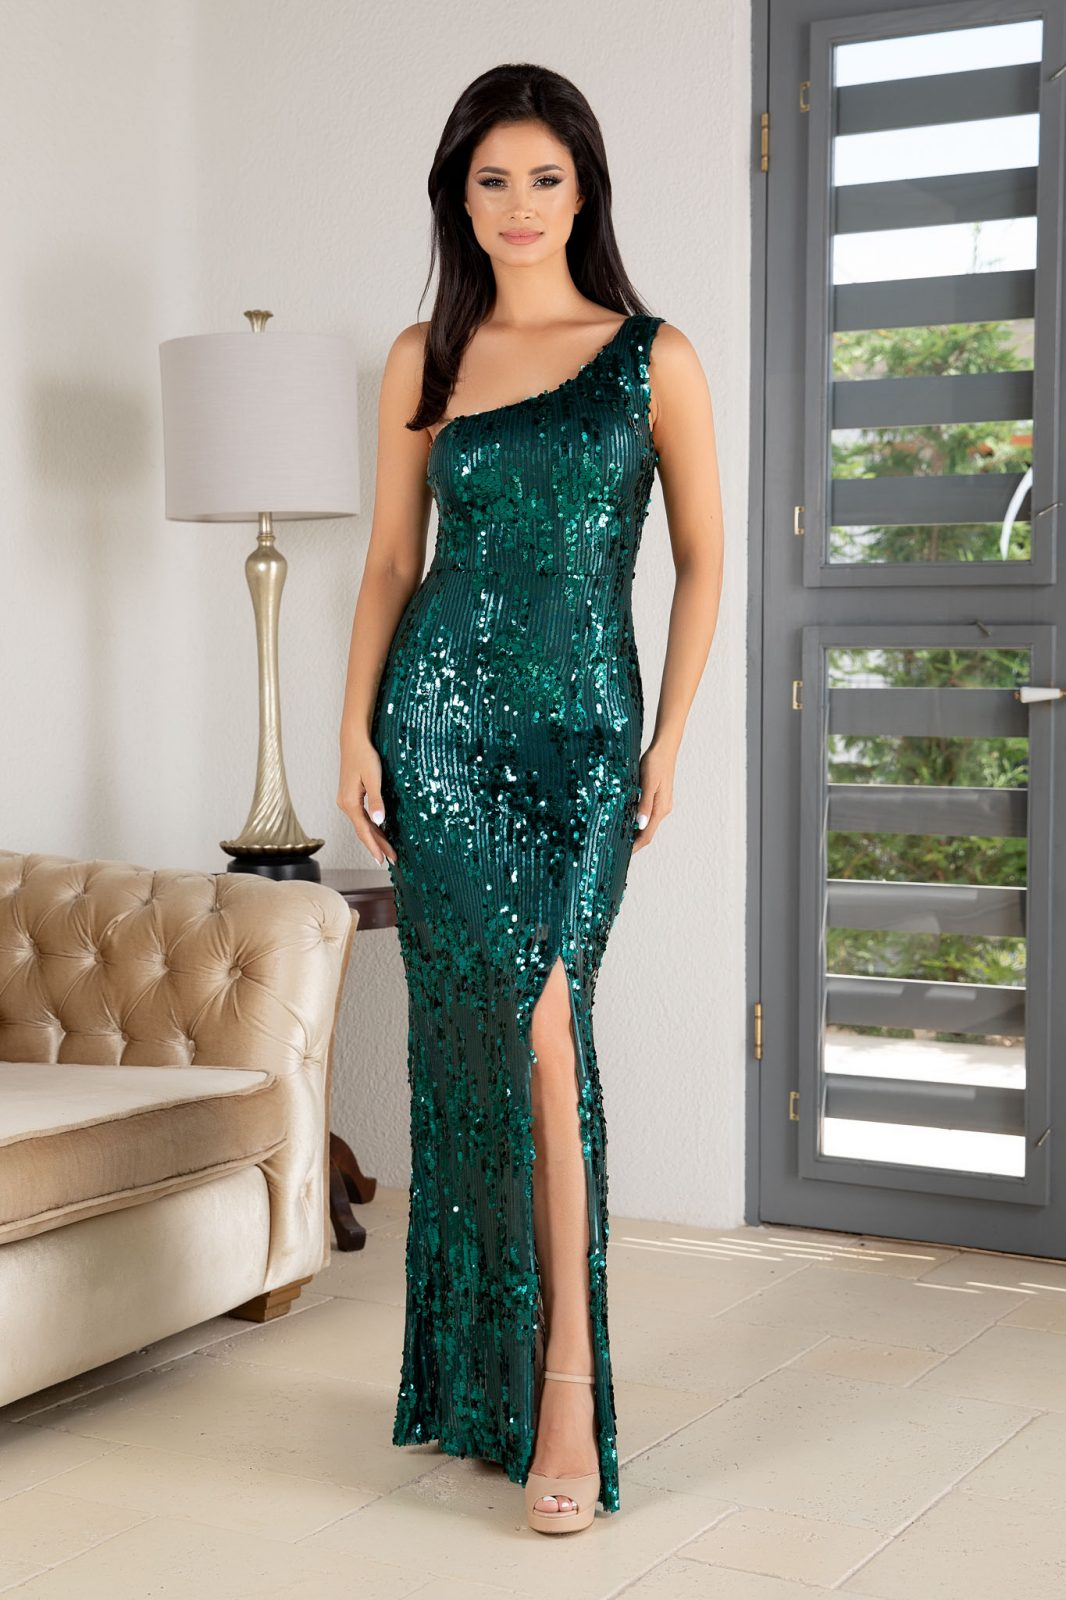 Tiarra Green Dress